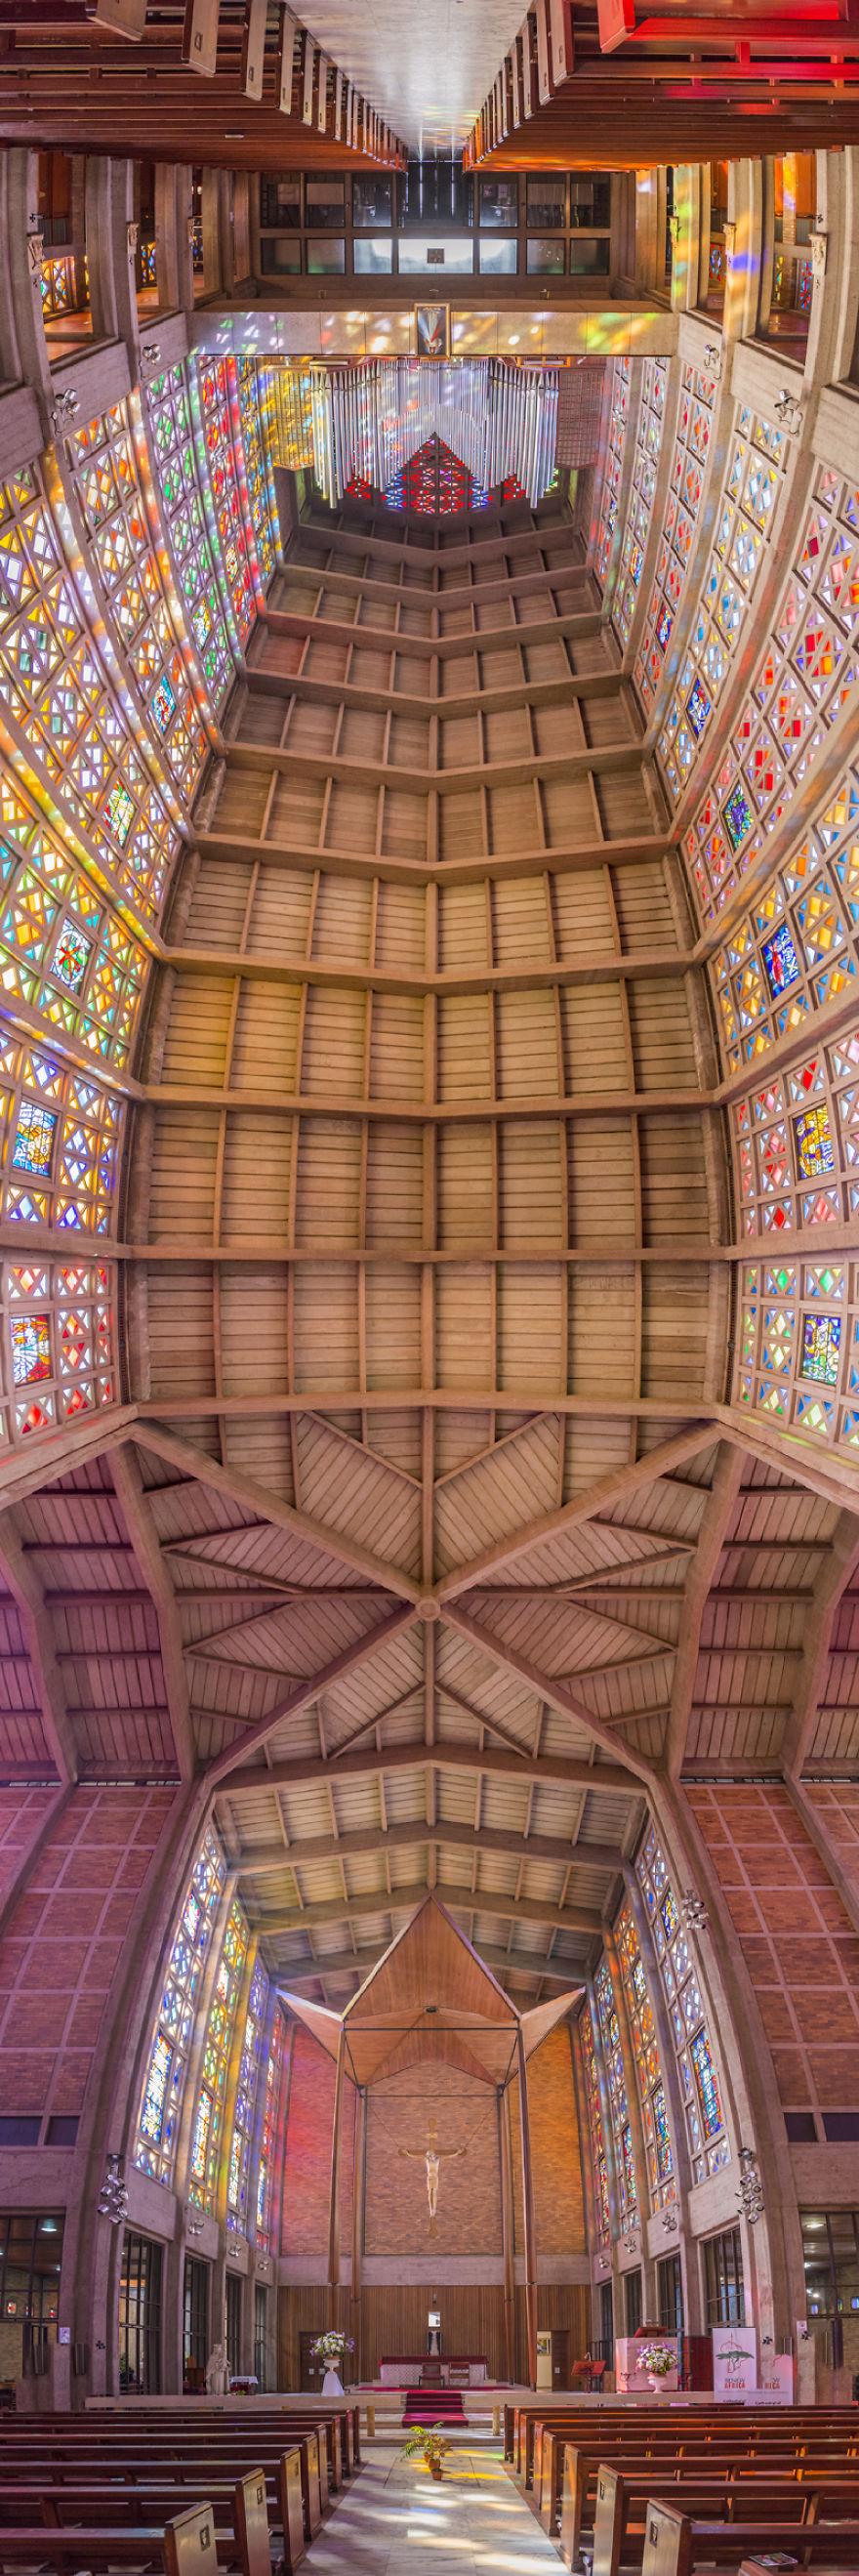 catedrales fotografiadas vertical 3